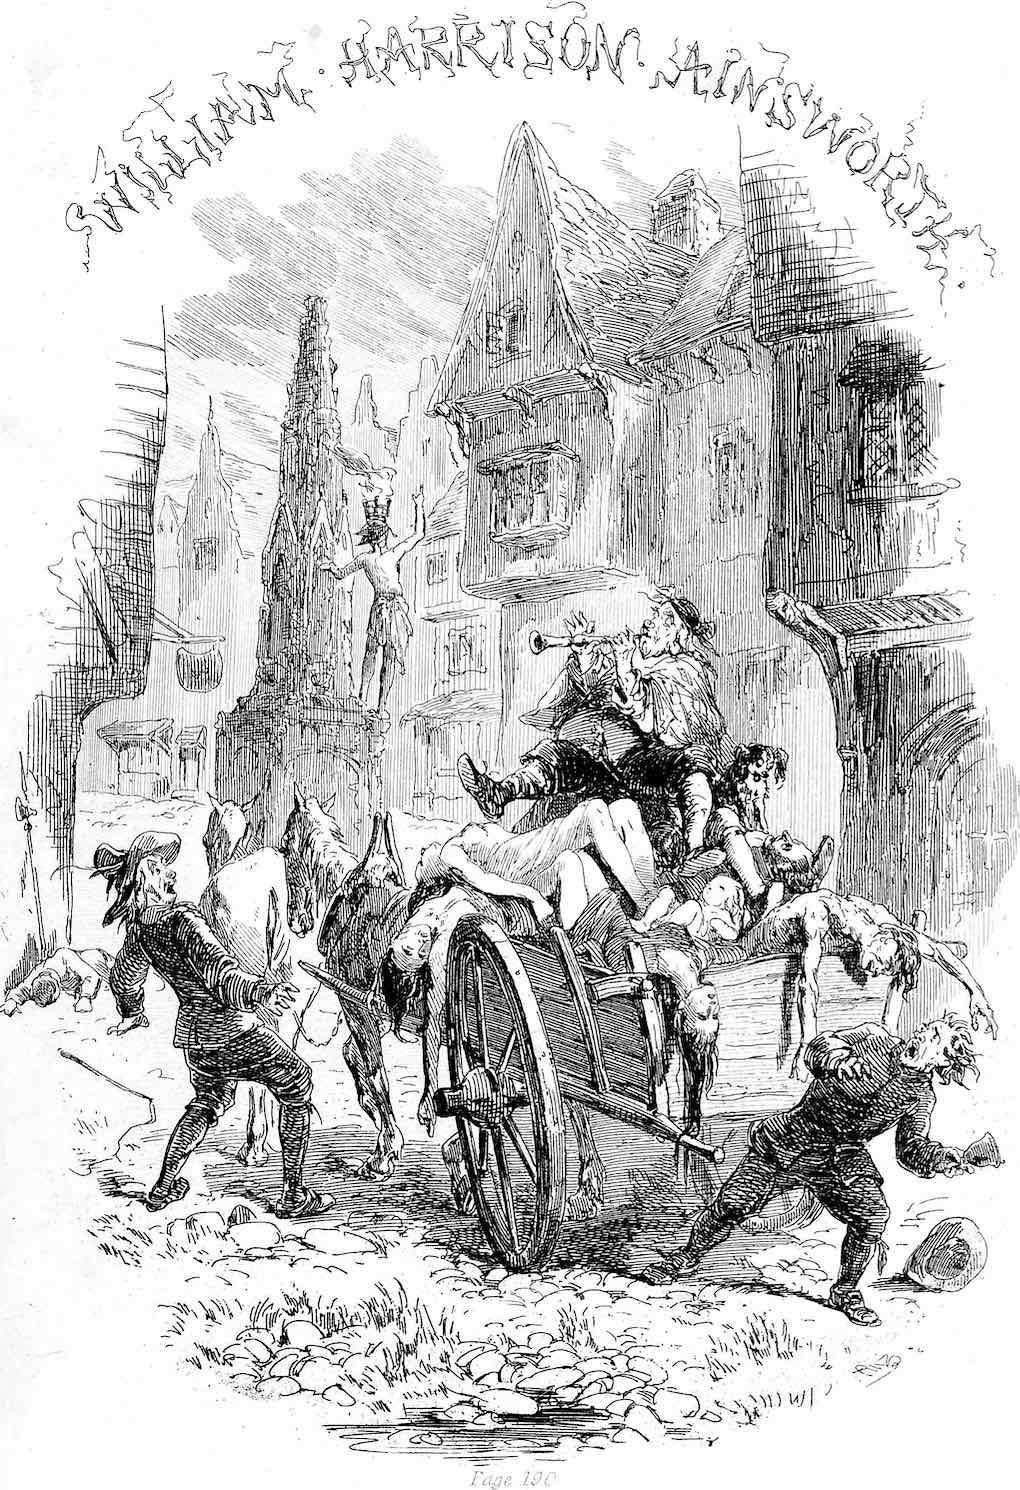 a John Franklin illustration 1847, bring out your dead